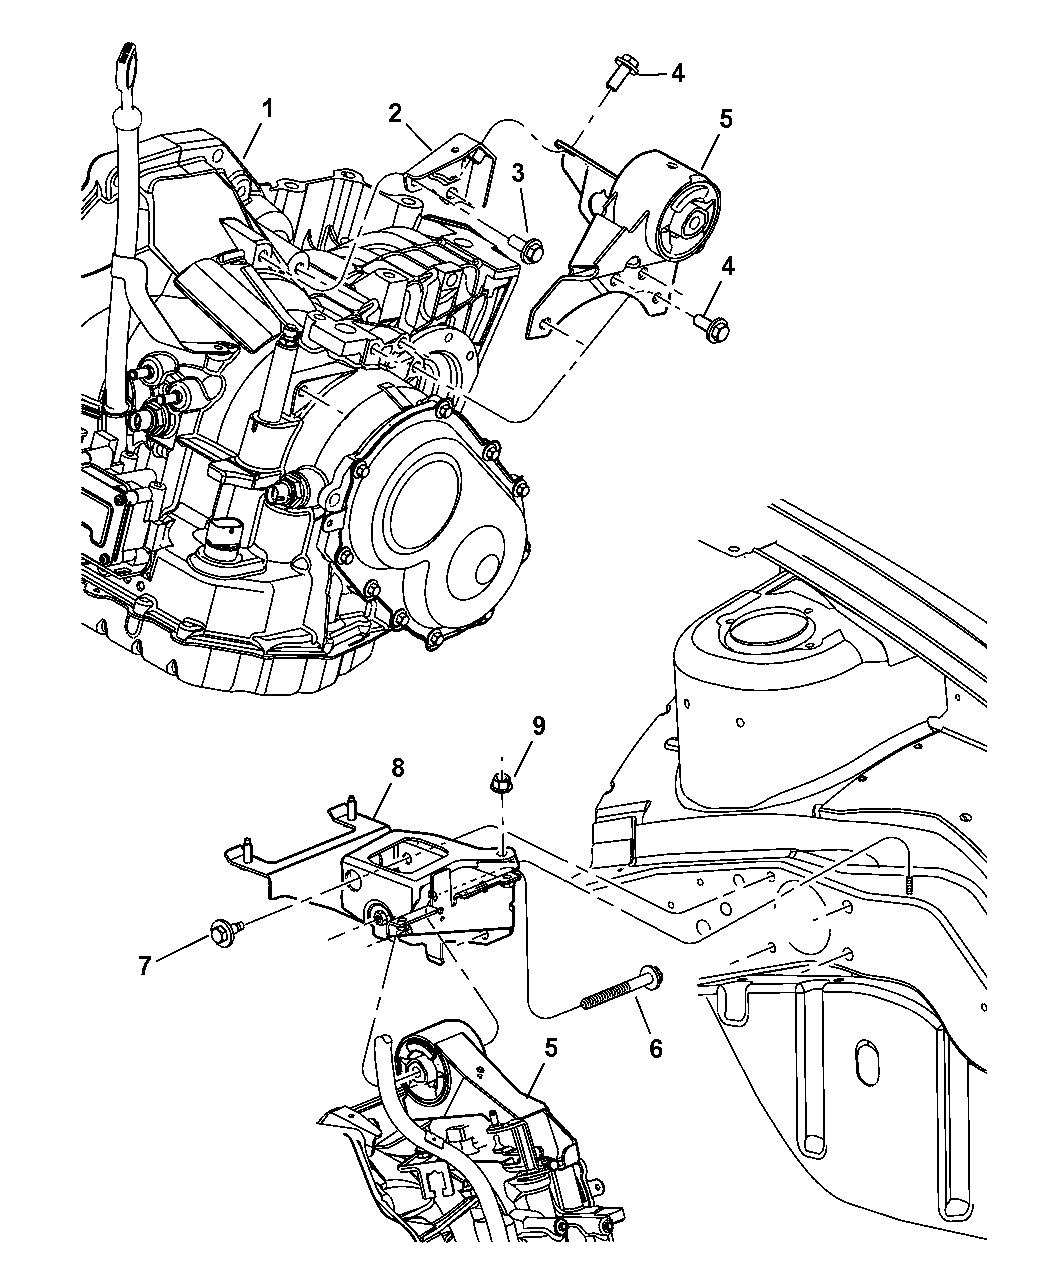 dodge neon engine parts diagram 2004 dodge neon mount  transmission mopar parts giant  2004 dodge neon mount  transmission